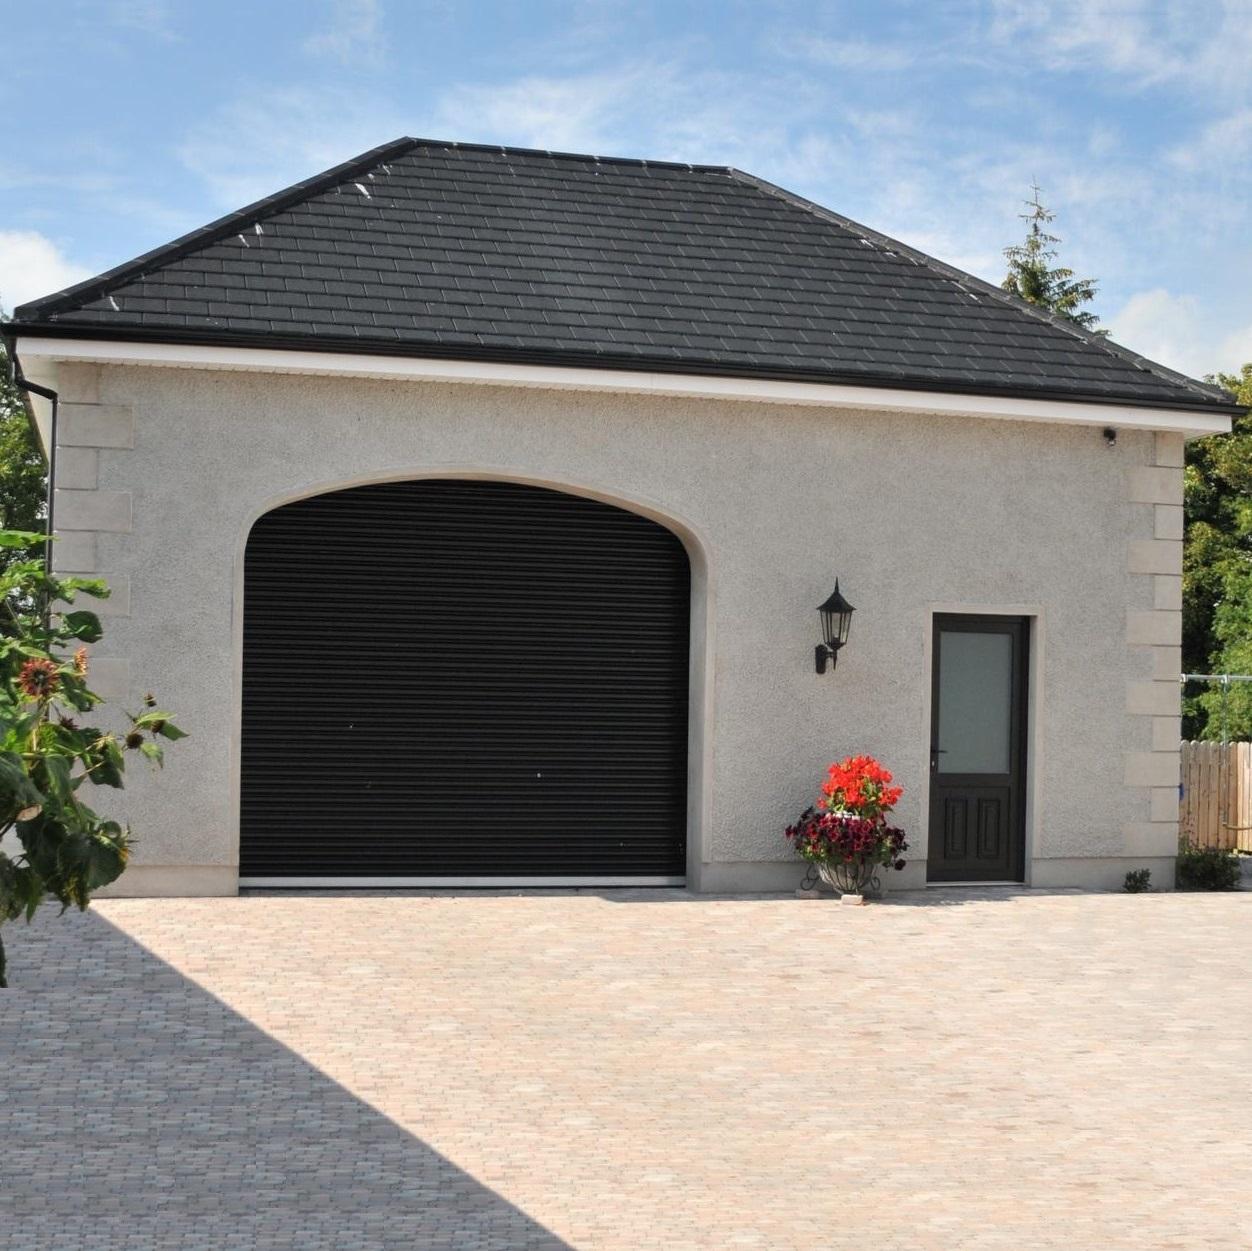 1251 #2F649C Residential Door Gallery Best Choice Garage Doors image Best Residential Garage Doors 37831252